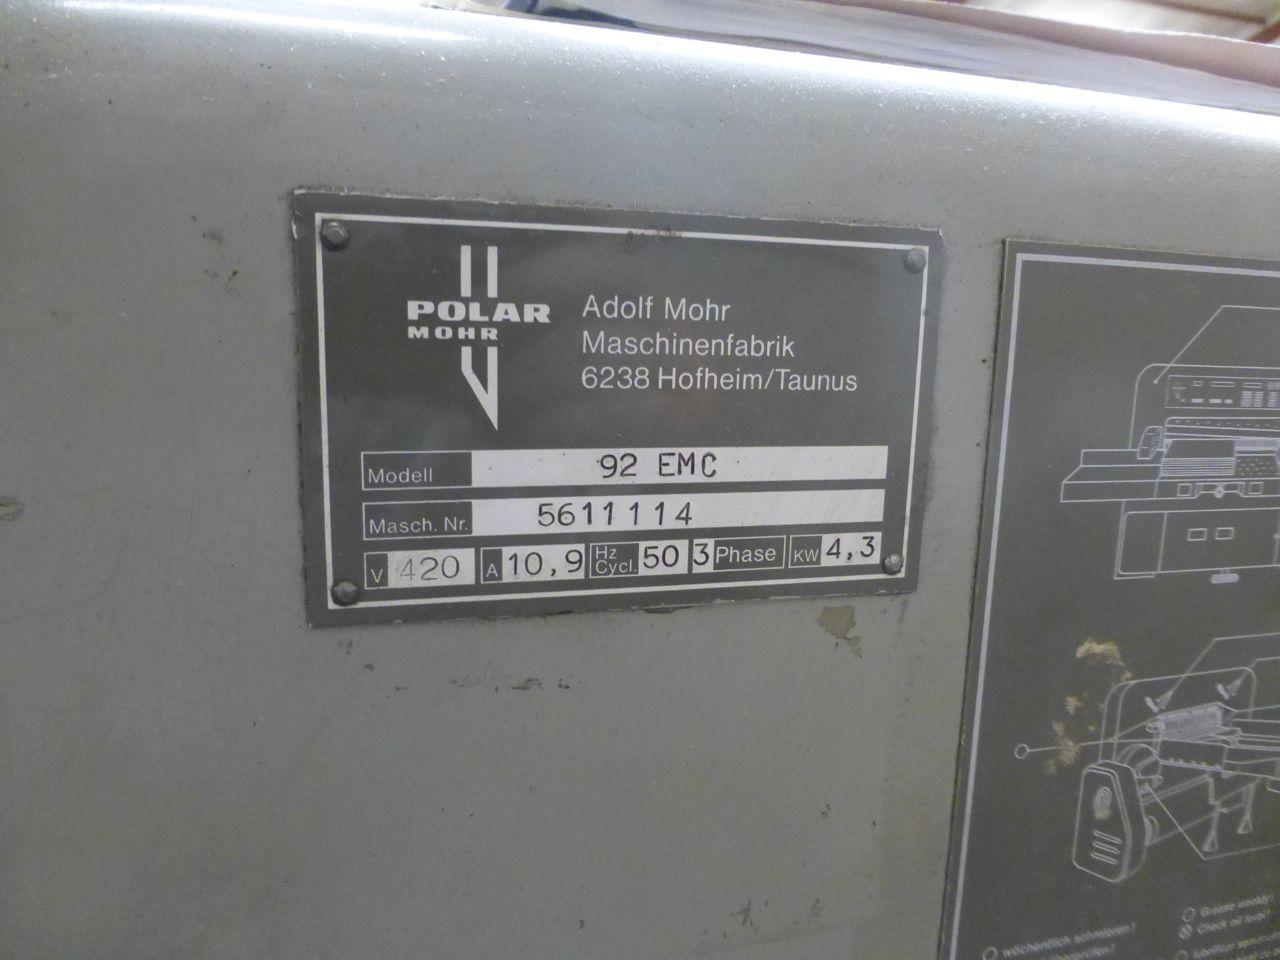 POLAR 92 EMC GUILLOTINE